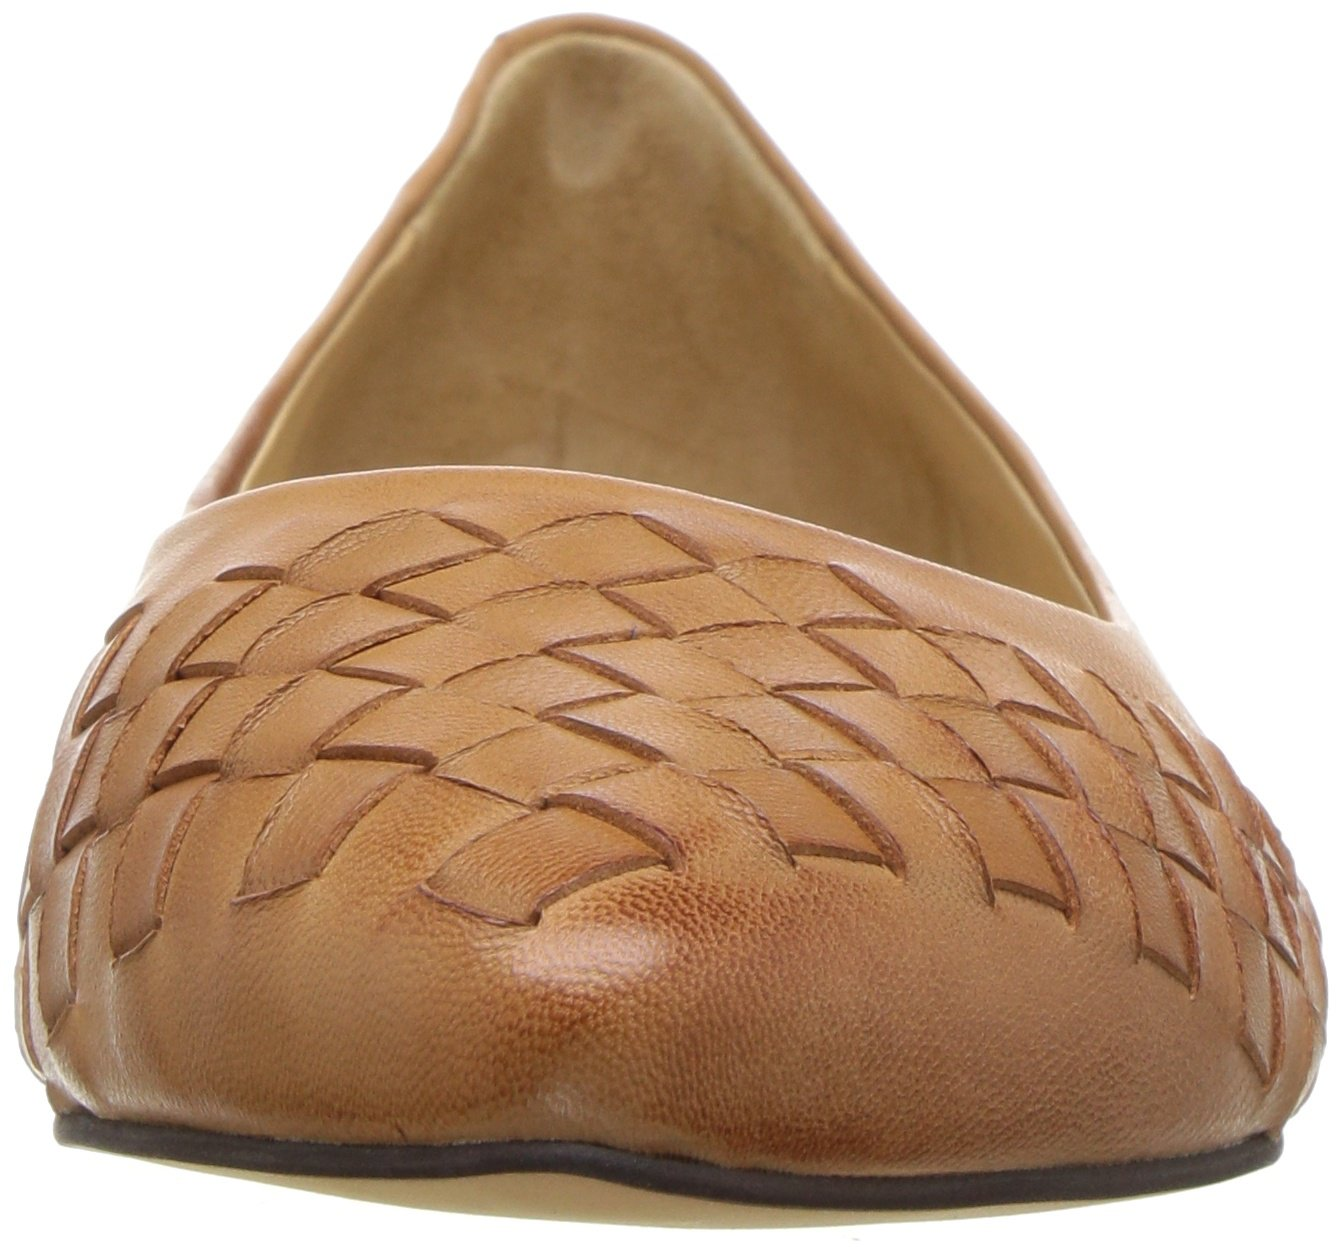 Trotters Women's Estee Woven Ballet US Tan Flat B01NGYR9AR 7.5 N US Tan Ballet 41e823